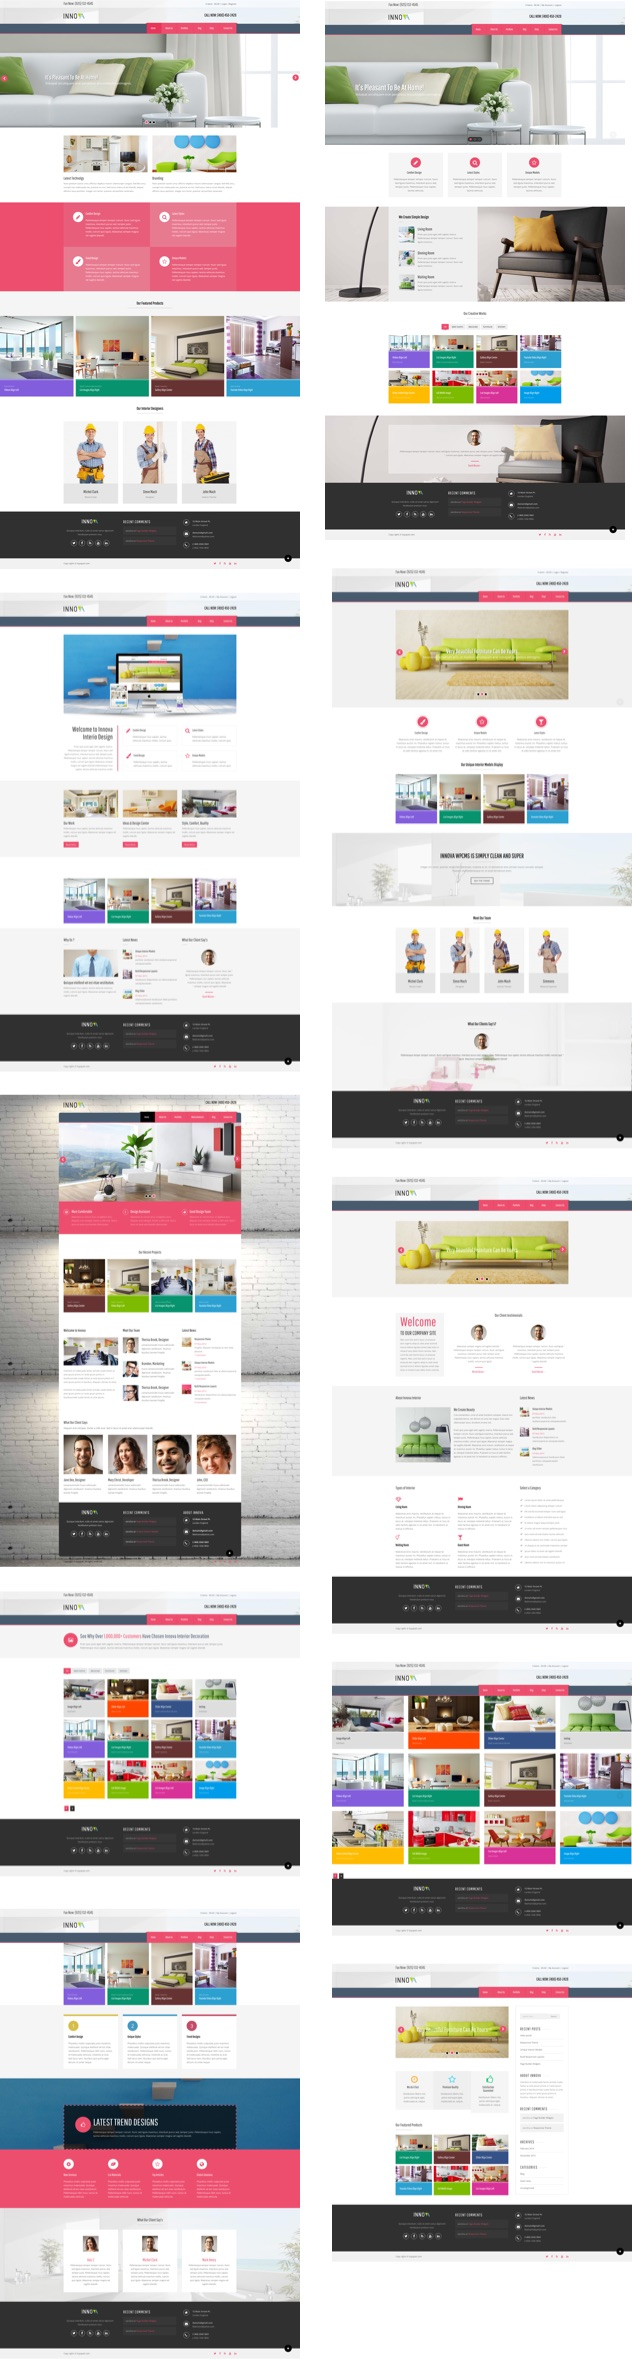 innova - Innova - Furniture WordPress CMS Theme